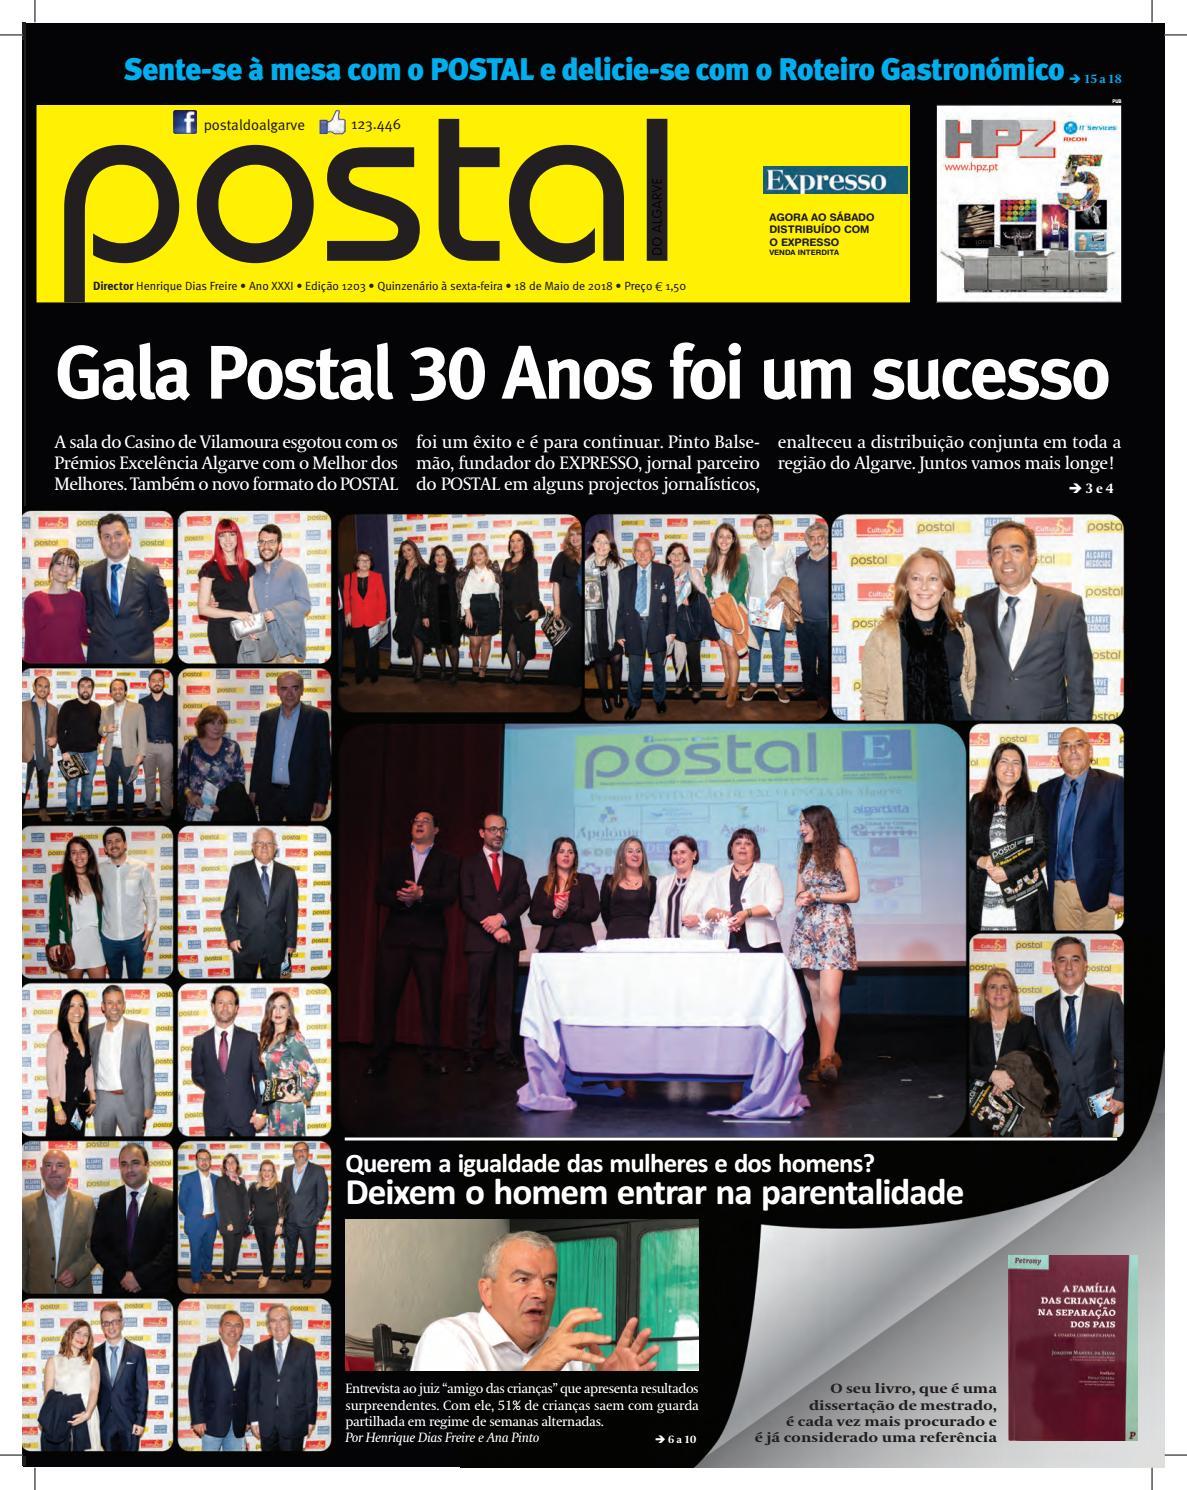 c0a8c8a601 Postal 1203 18MAI2018 by POSTAL do ALGARVE - issuu